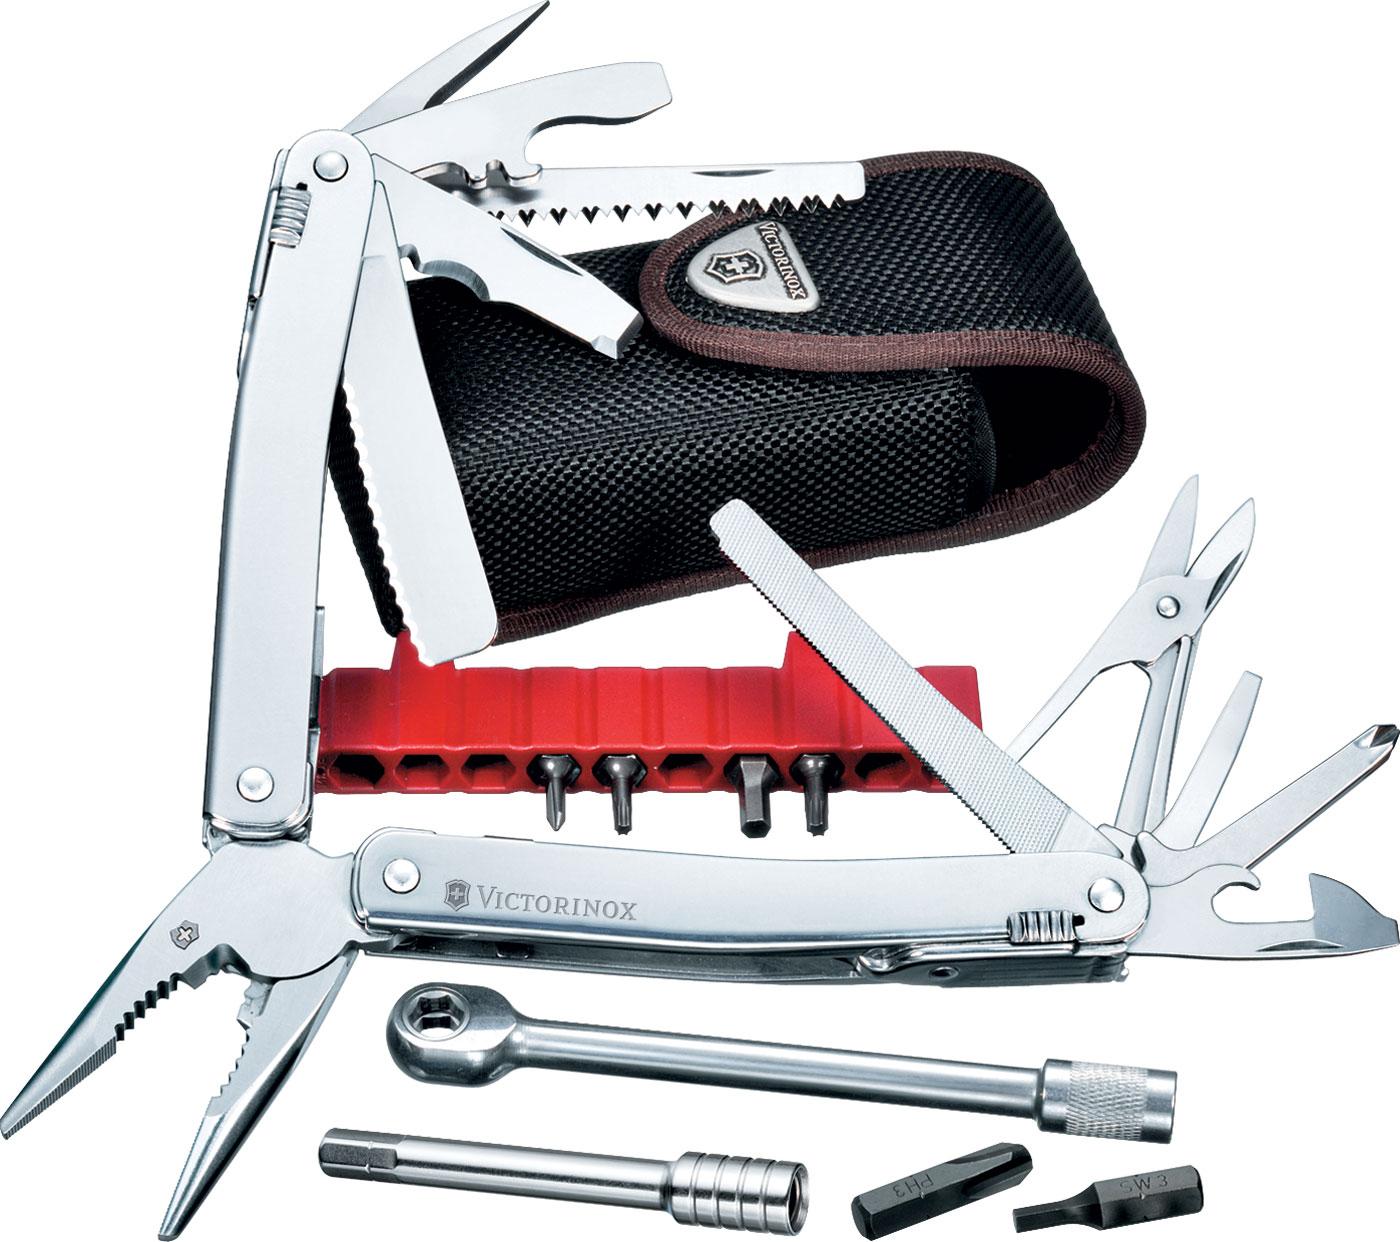 Victorinox Swiss Army SwissTool Spirit Plus Ratchet Multi-Tool 4.13 inch Closed, Nylon Sheath